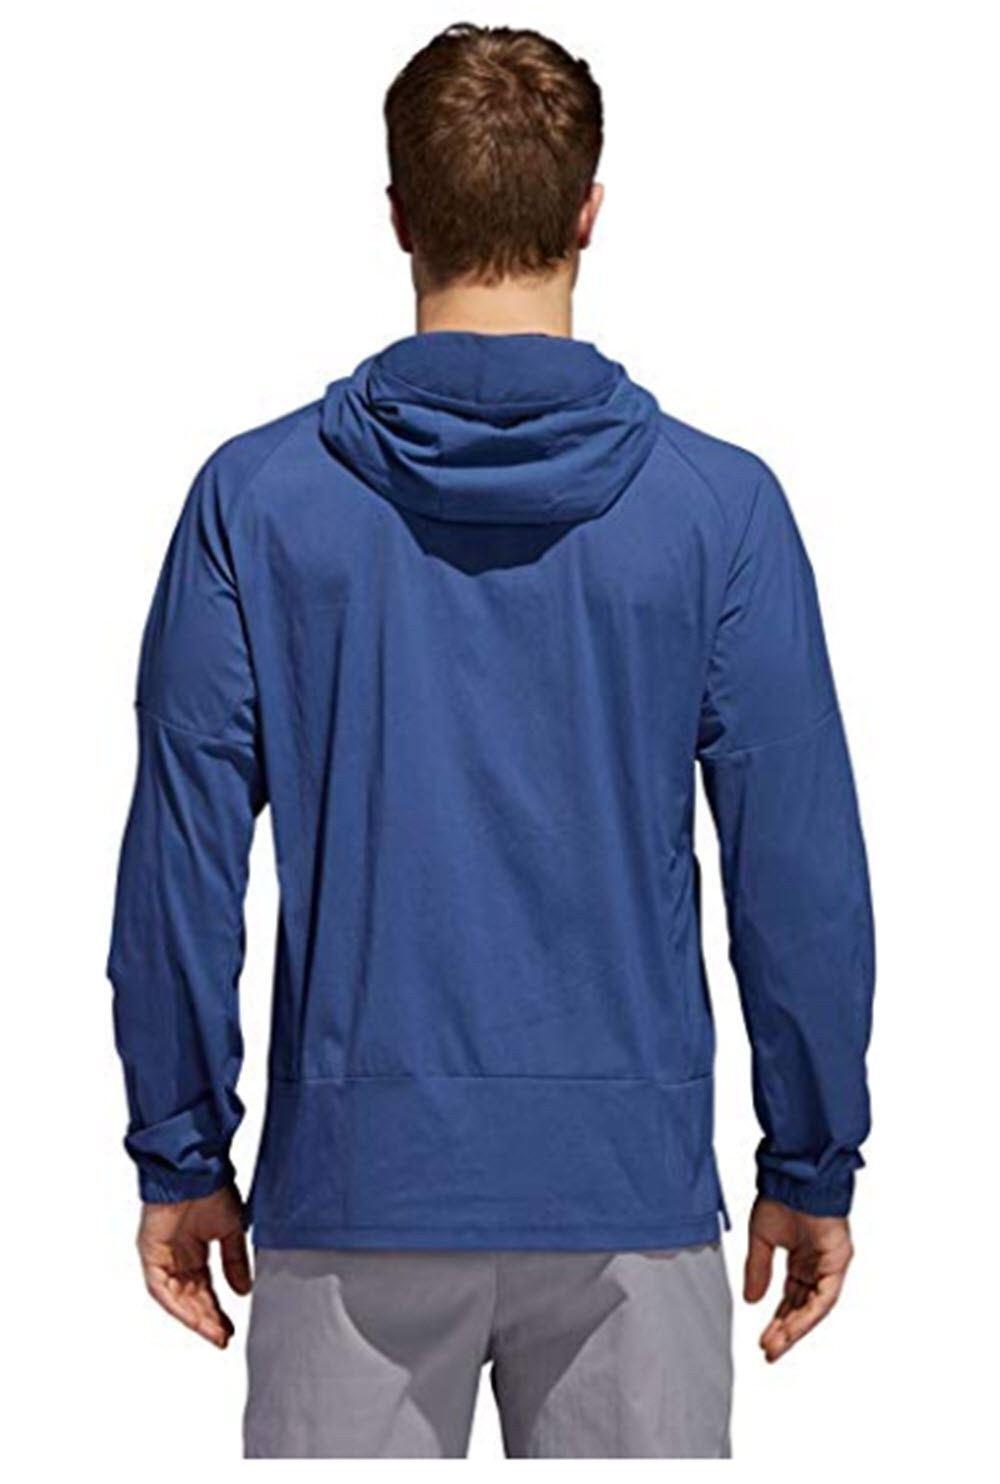 Adidas ID Sport ID Adidas Uomo Woven Hoodie - NAVY / RED - SIZE - SMALL - BRAND NEW bce18b